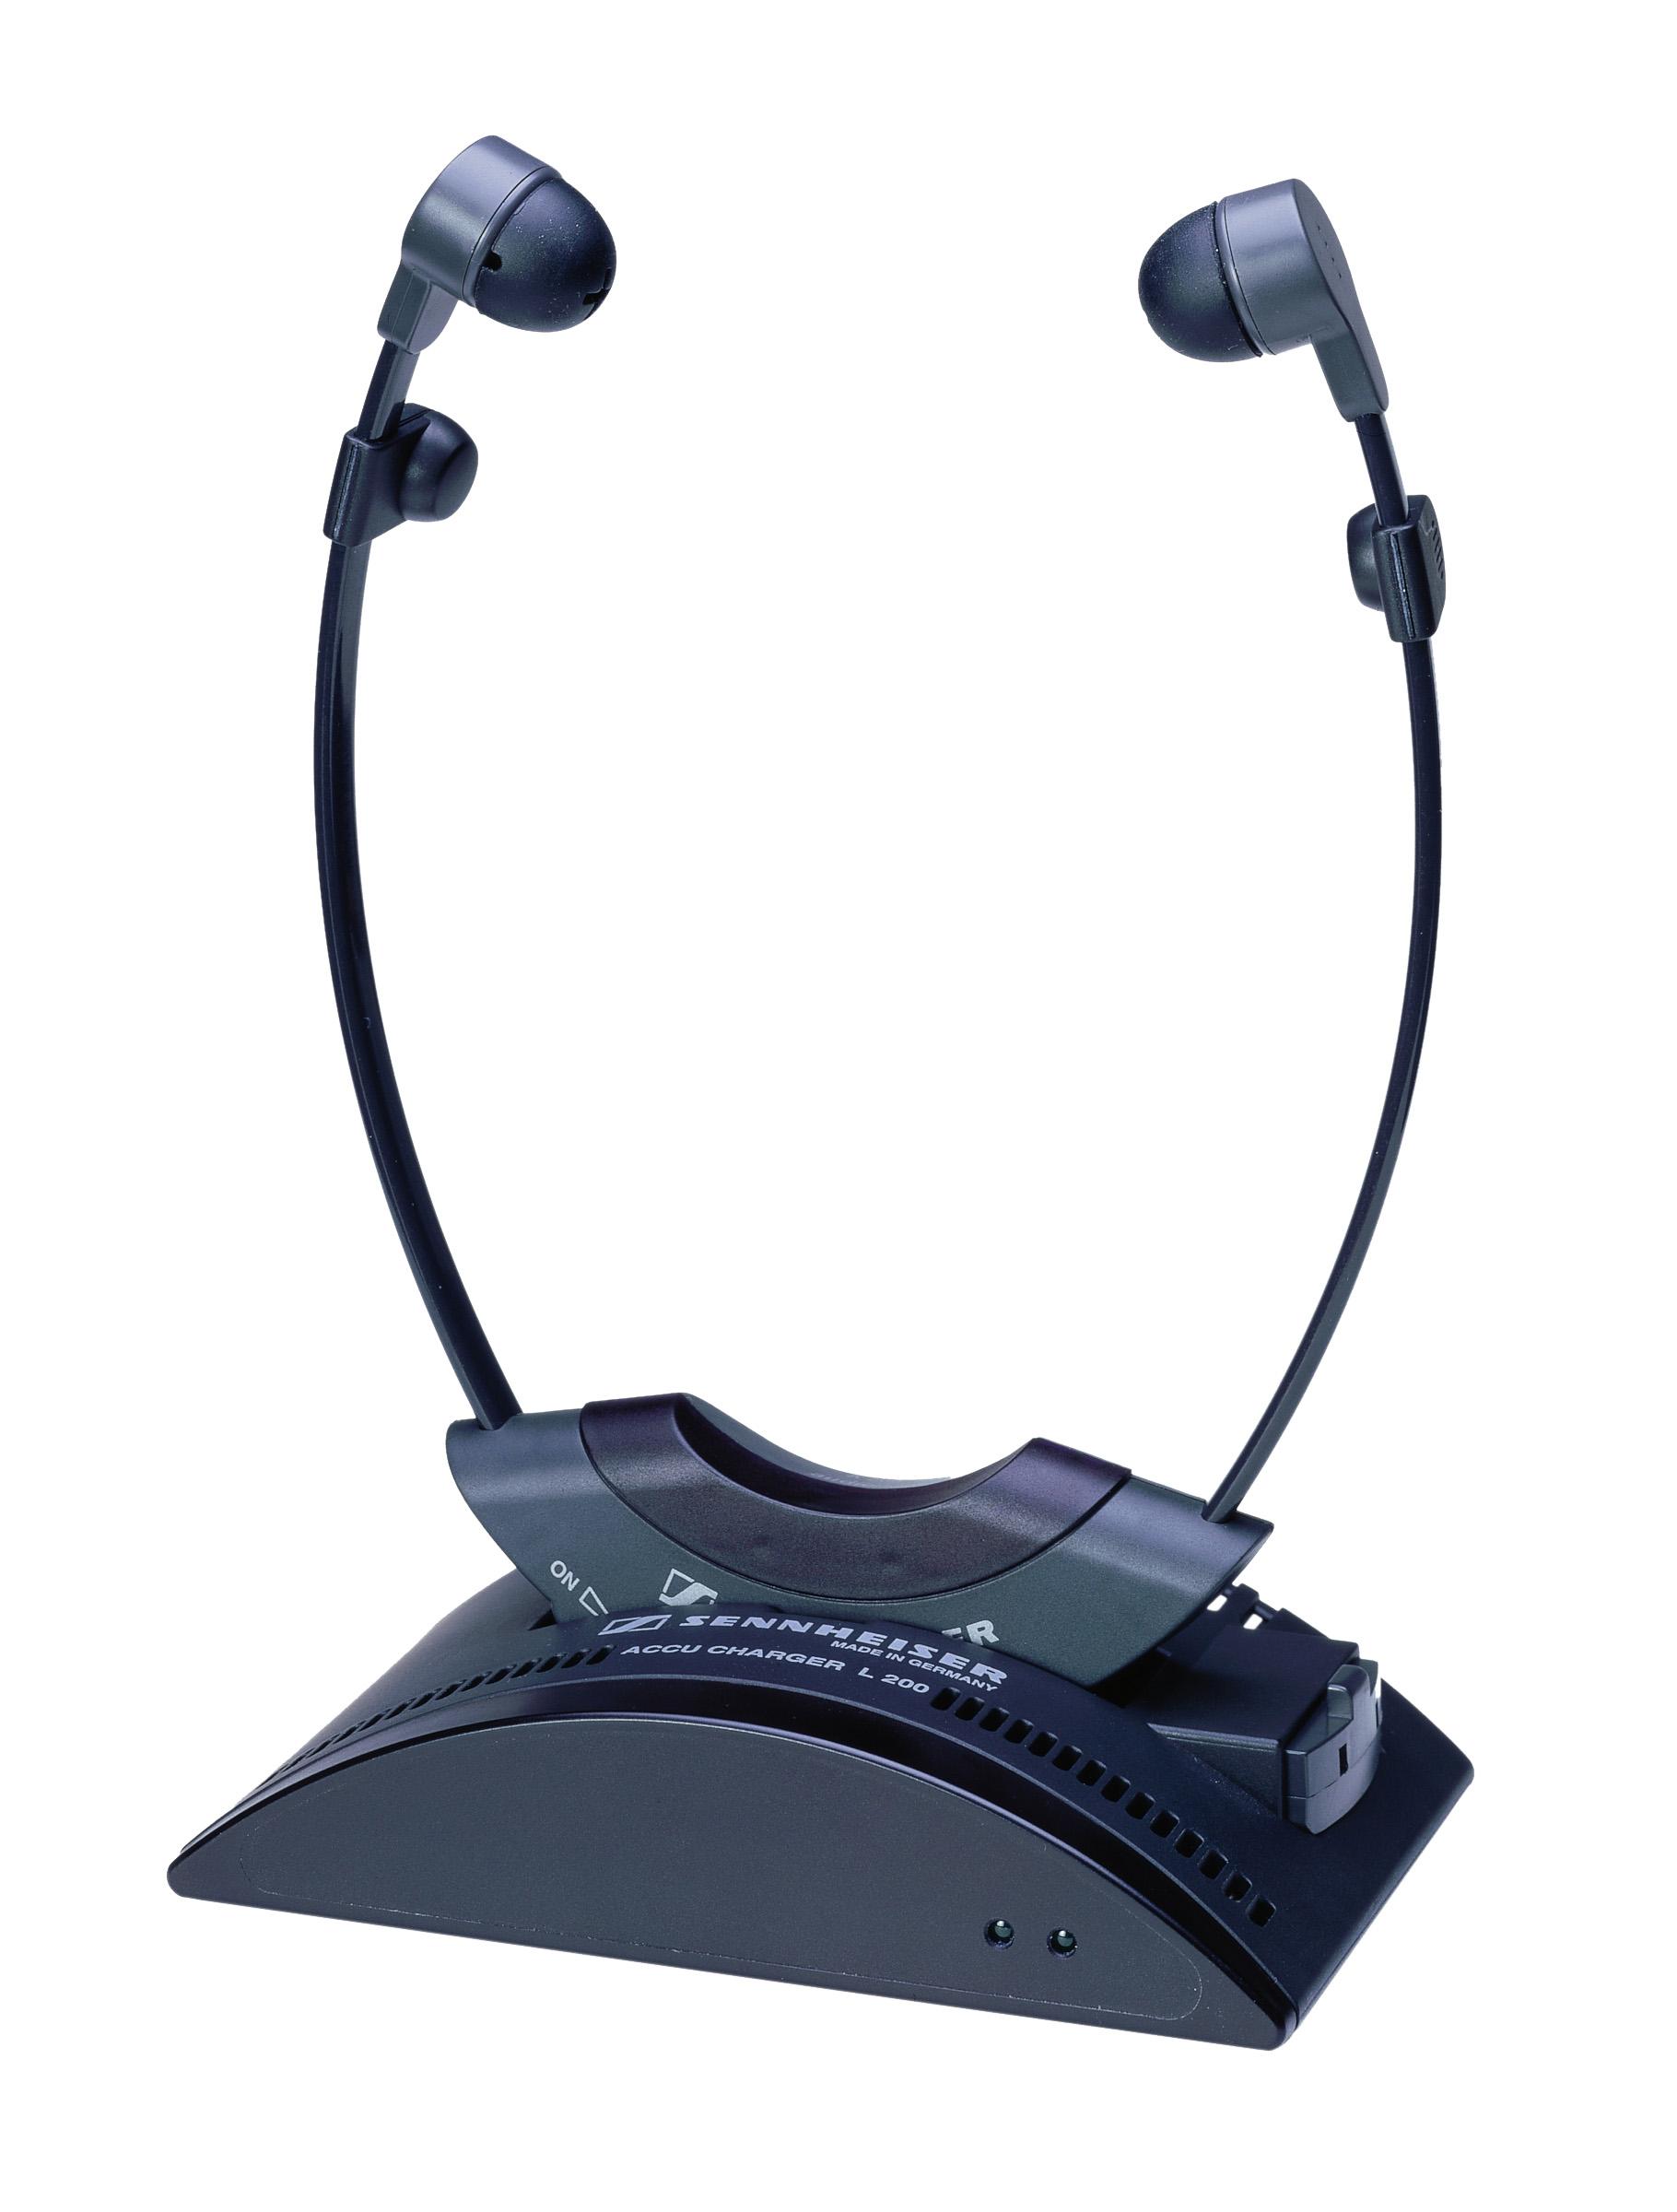 ec10dc42353 Sennheiser Stereo TV Listening Sound Amplifier - A 200 - wireless ...